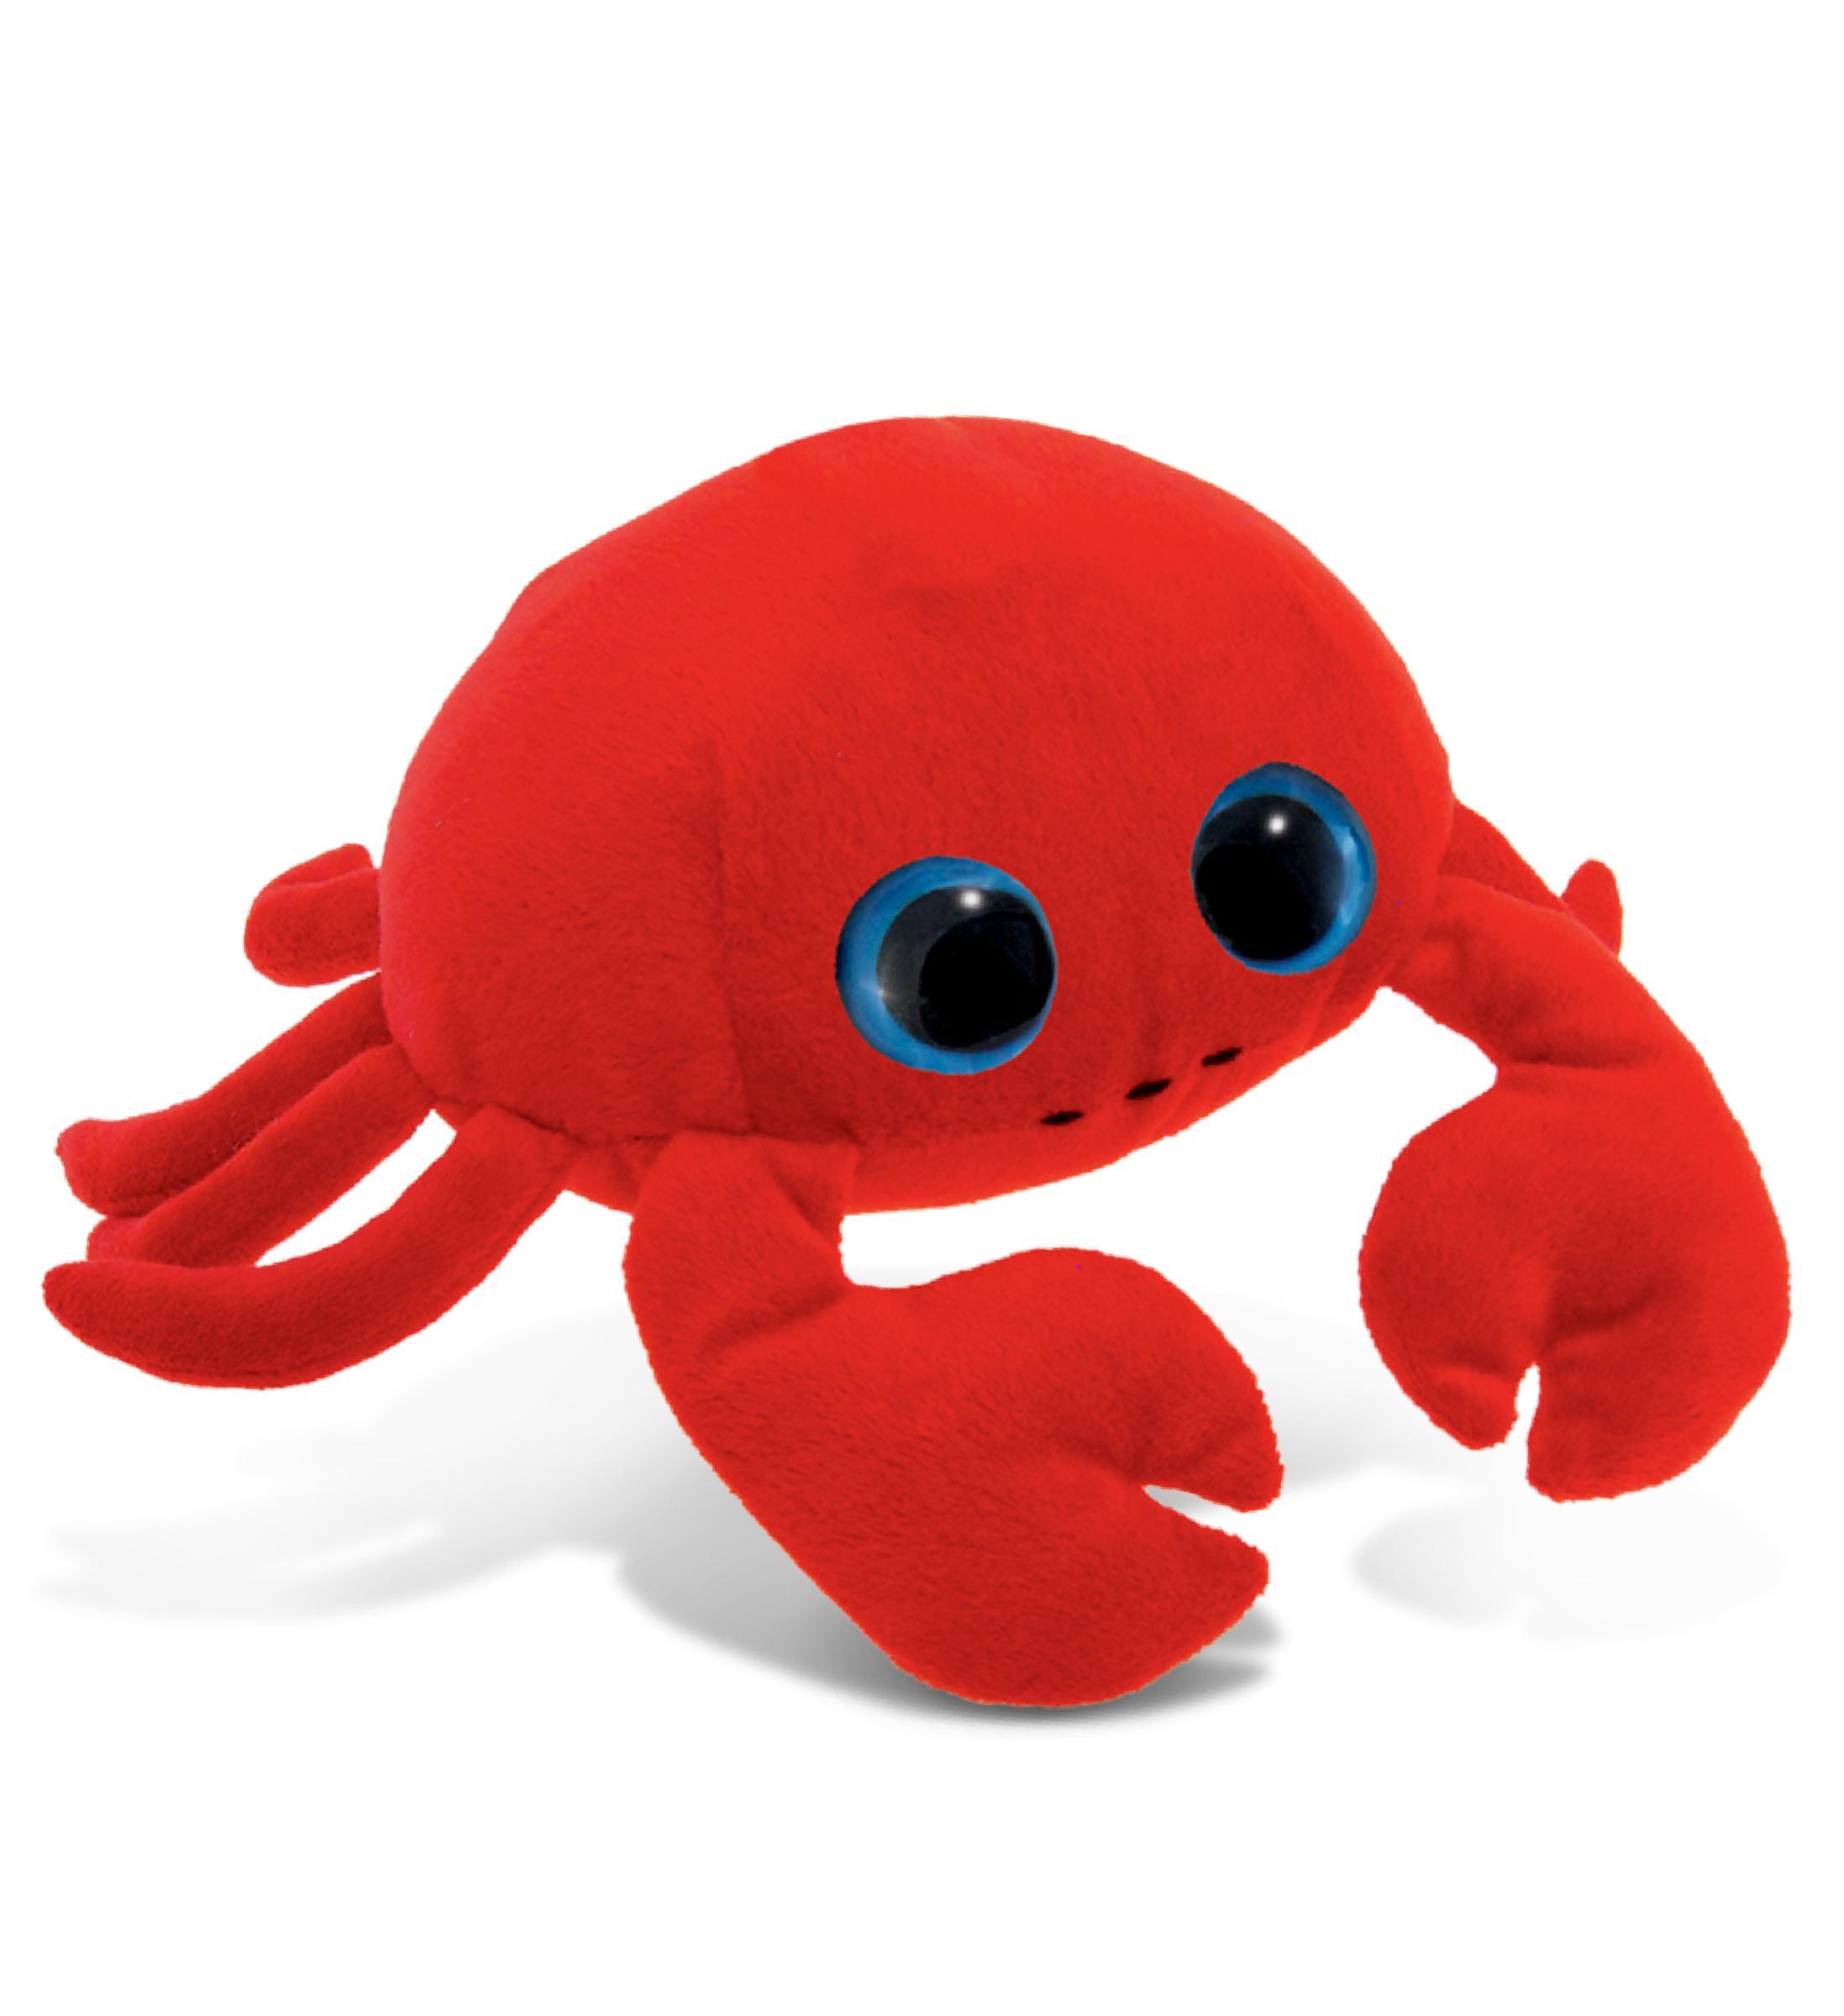 Red Crab - Big Eye 6 Inch Plush